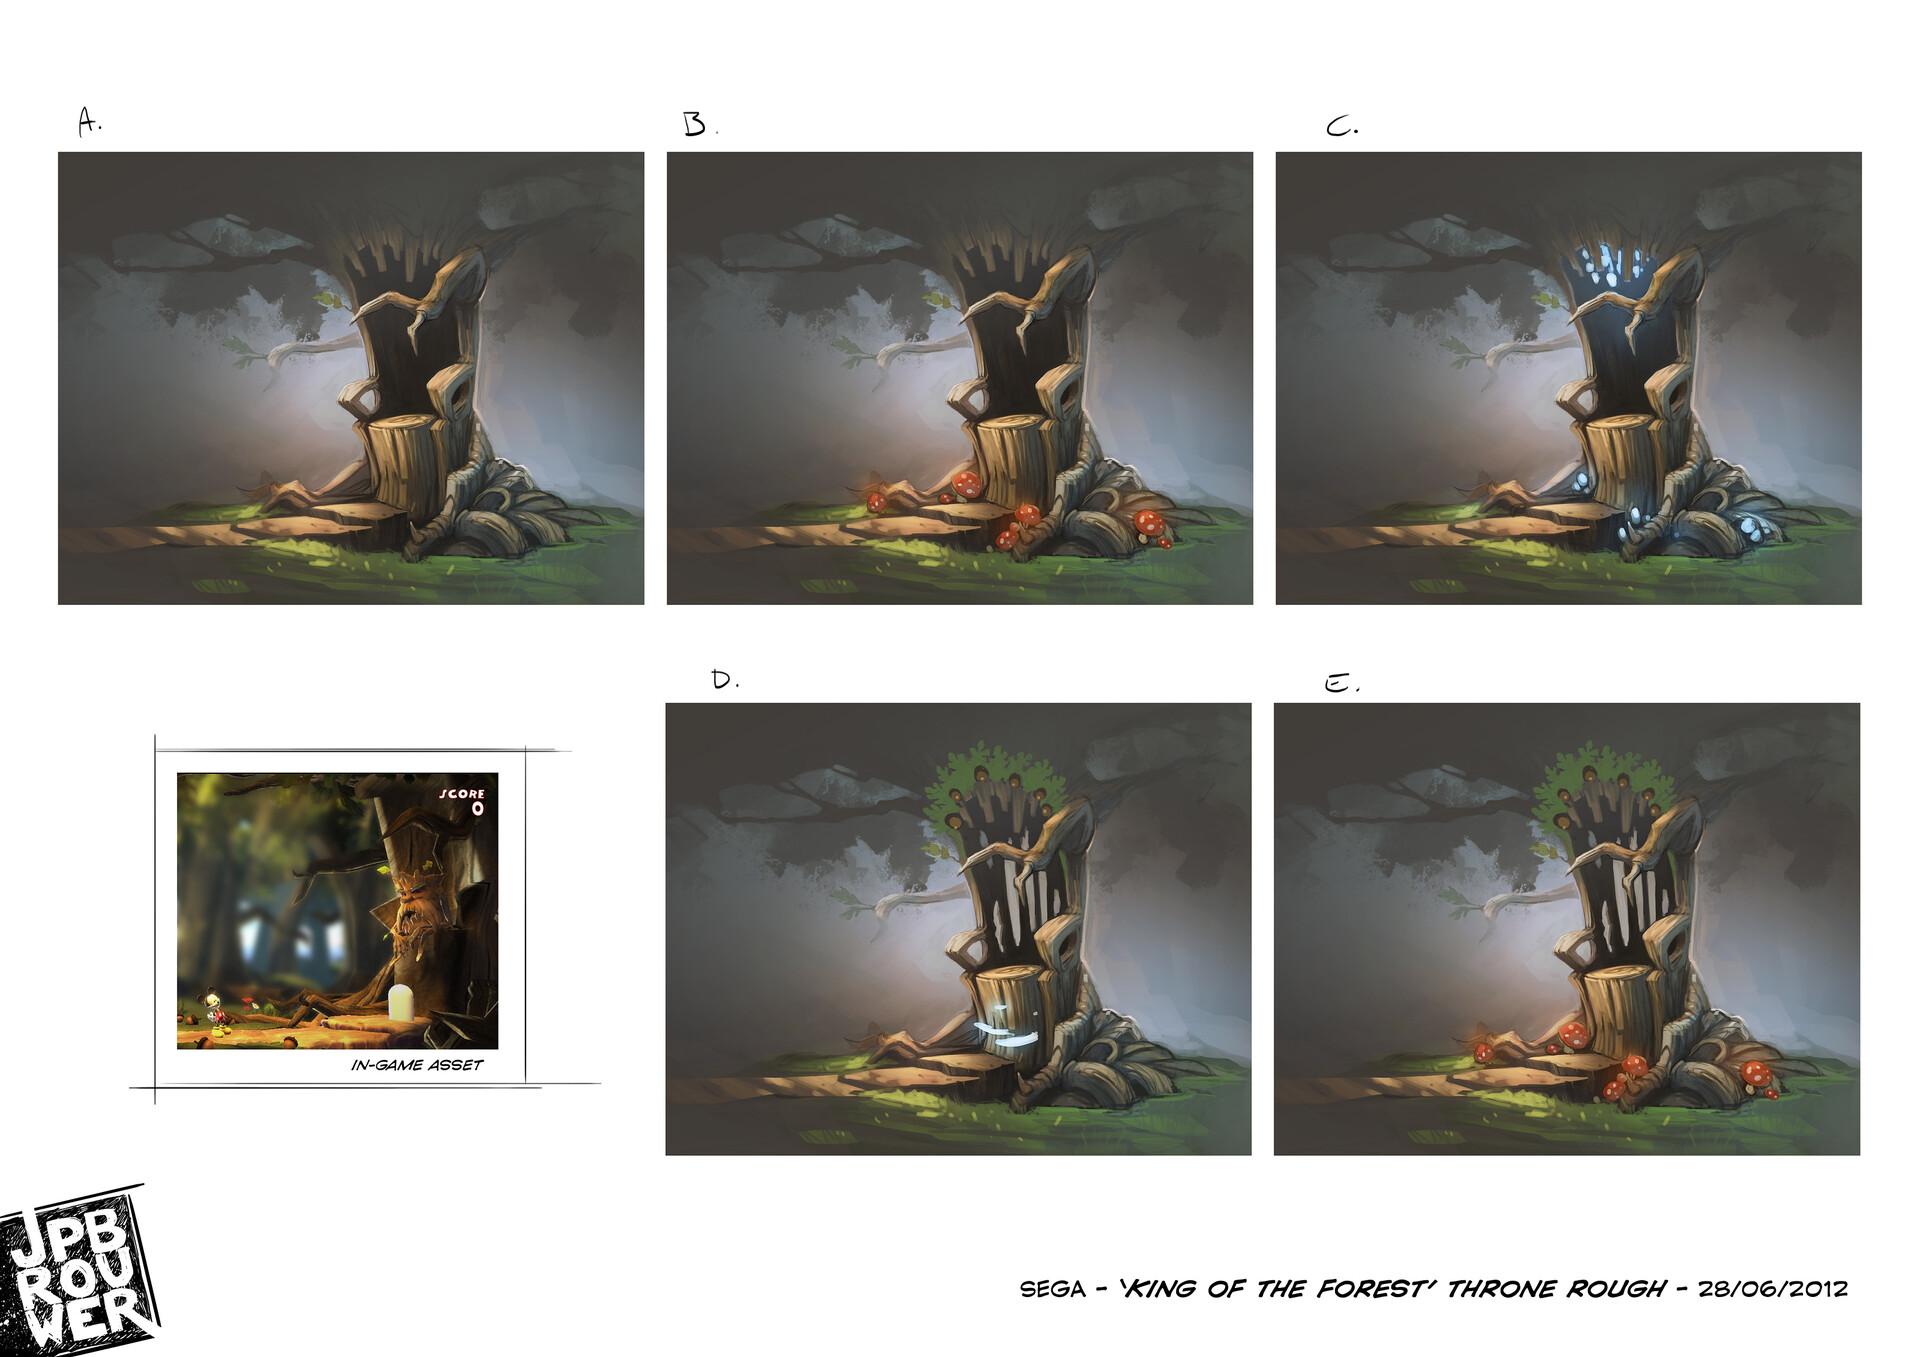 James brouwer sega kingoftheforest throne280612